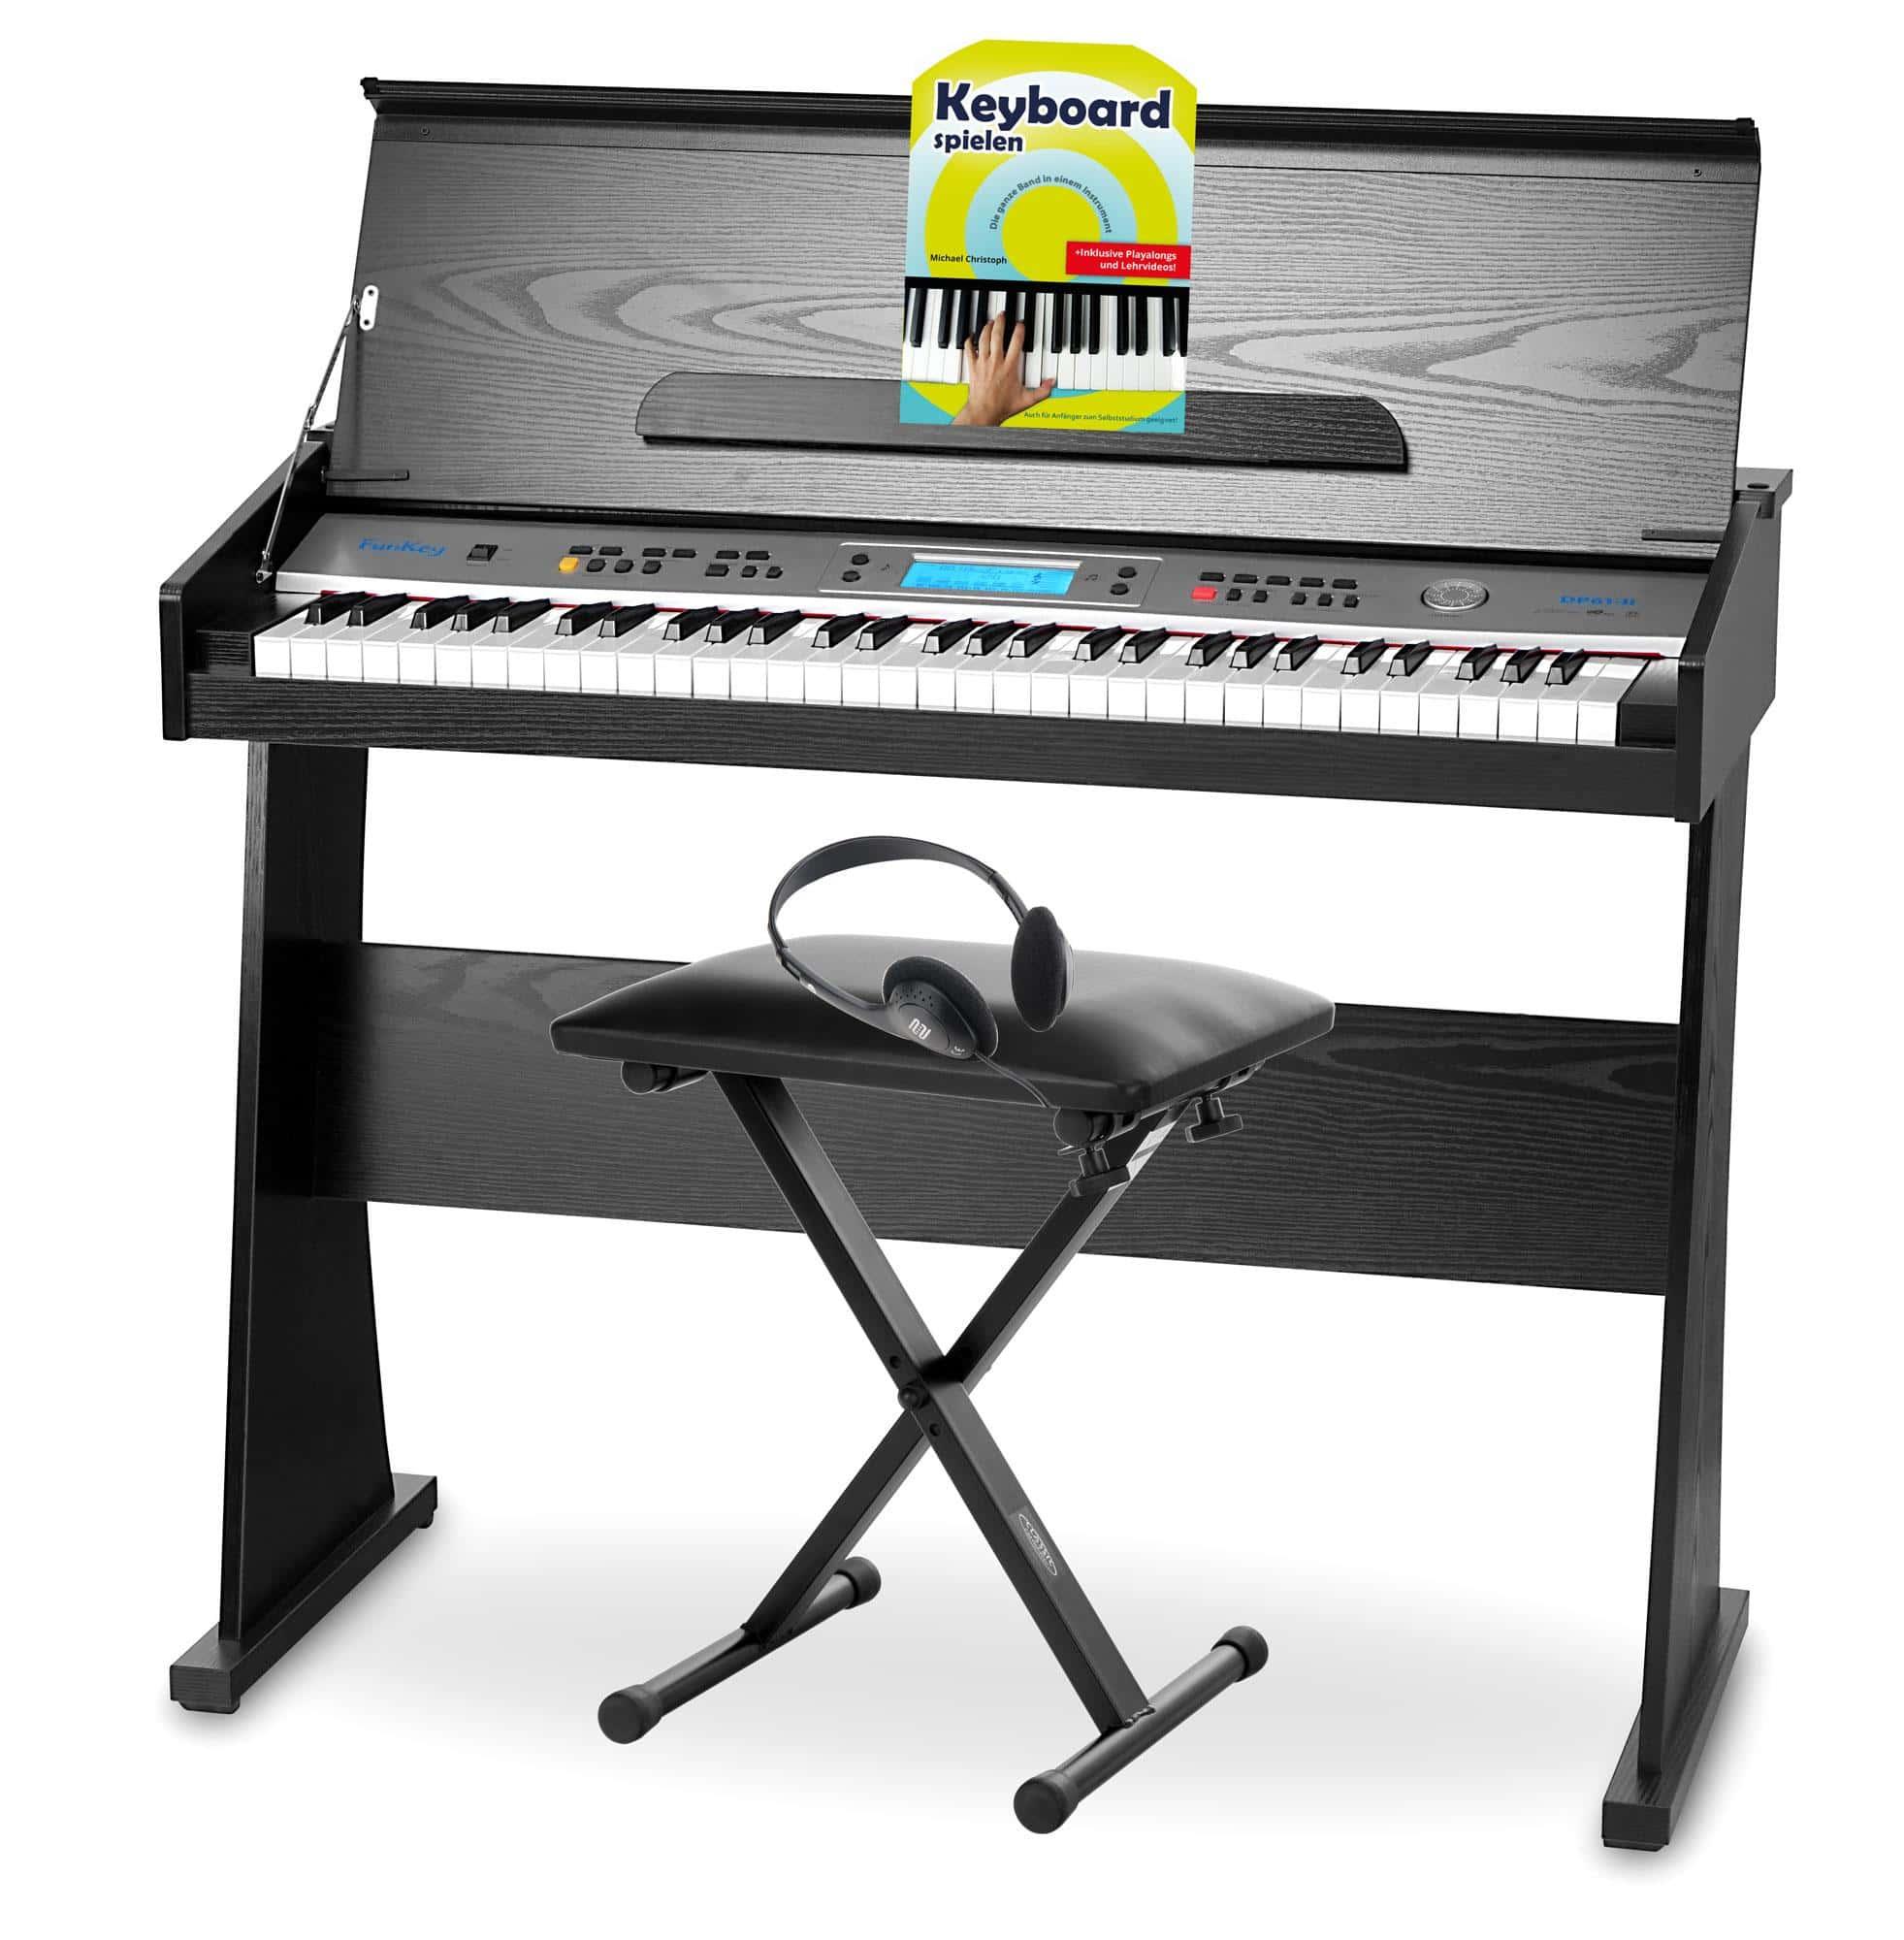 FunKey DP 61 II Keyboard mit 61 Tasten im Digitalpiano Design SET inkl. Bank Kopfhörer Pianoschule CD